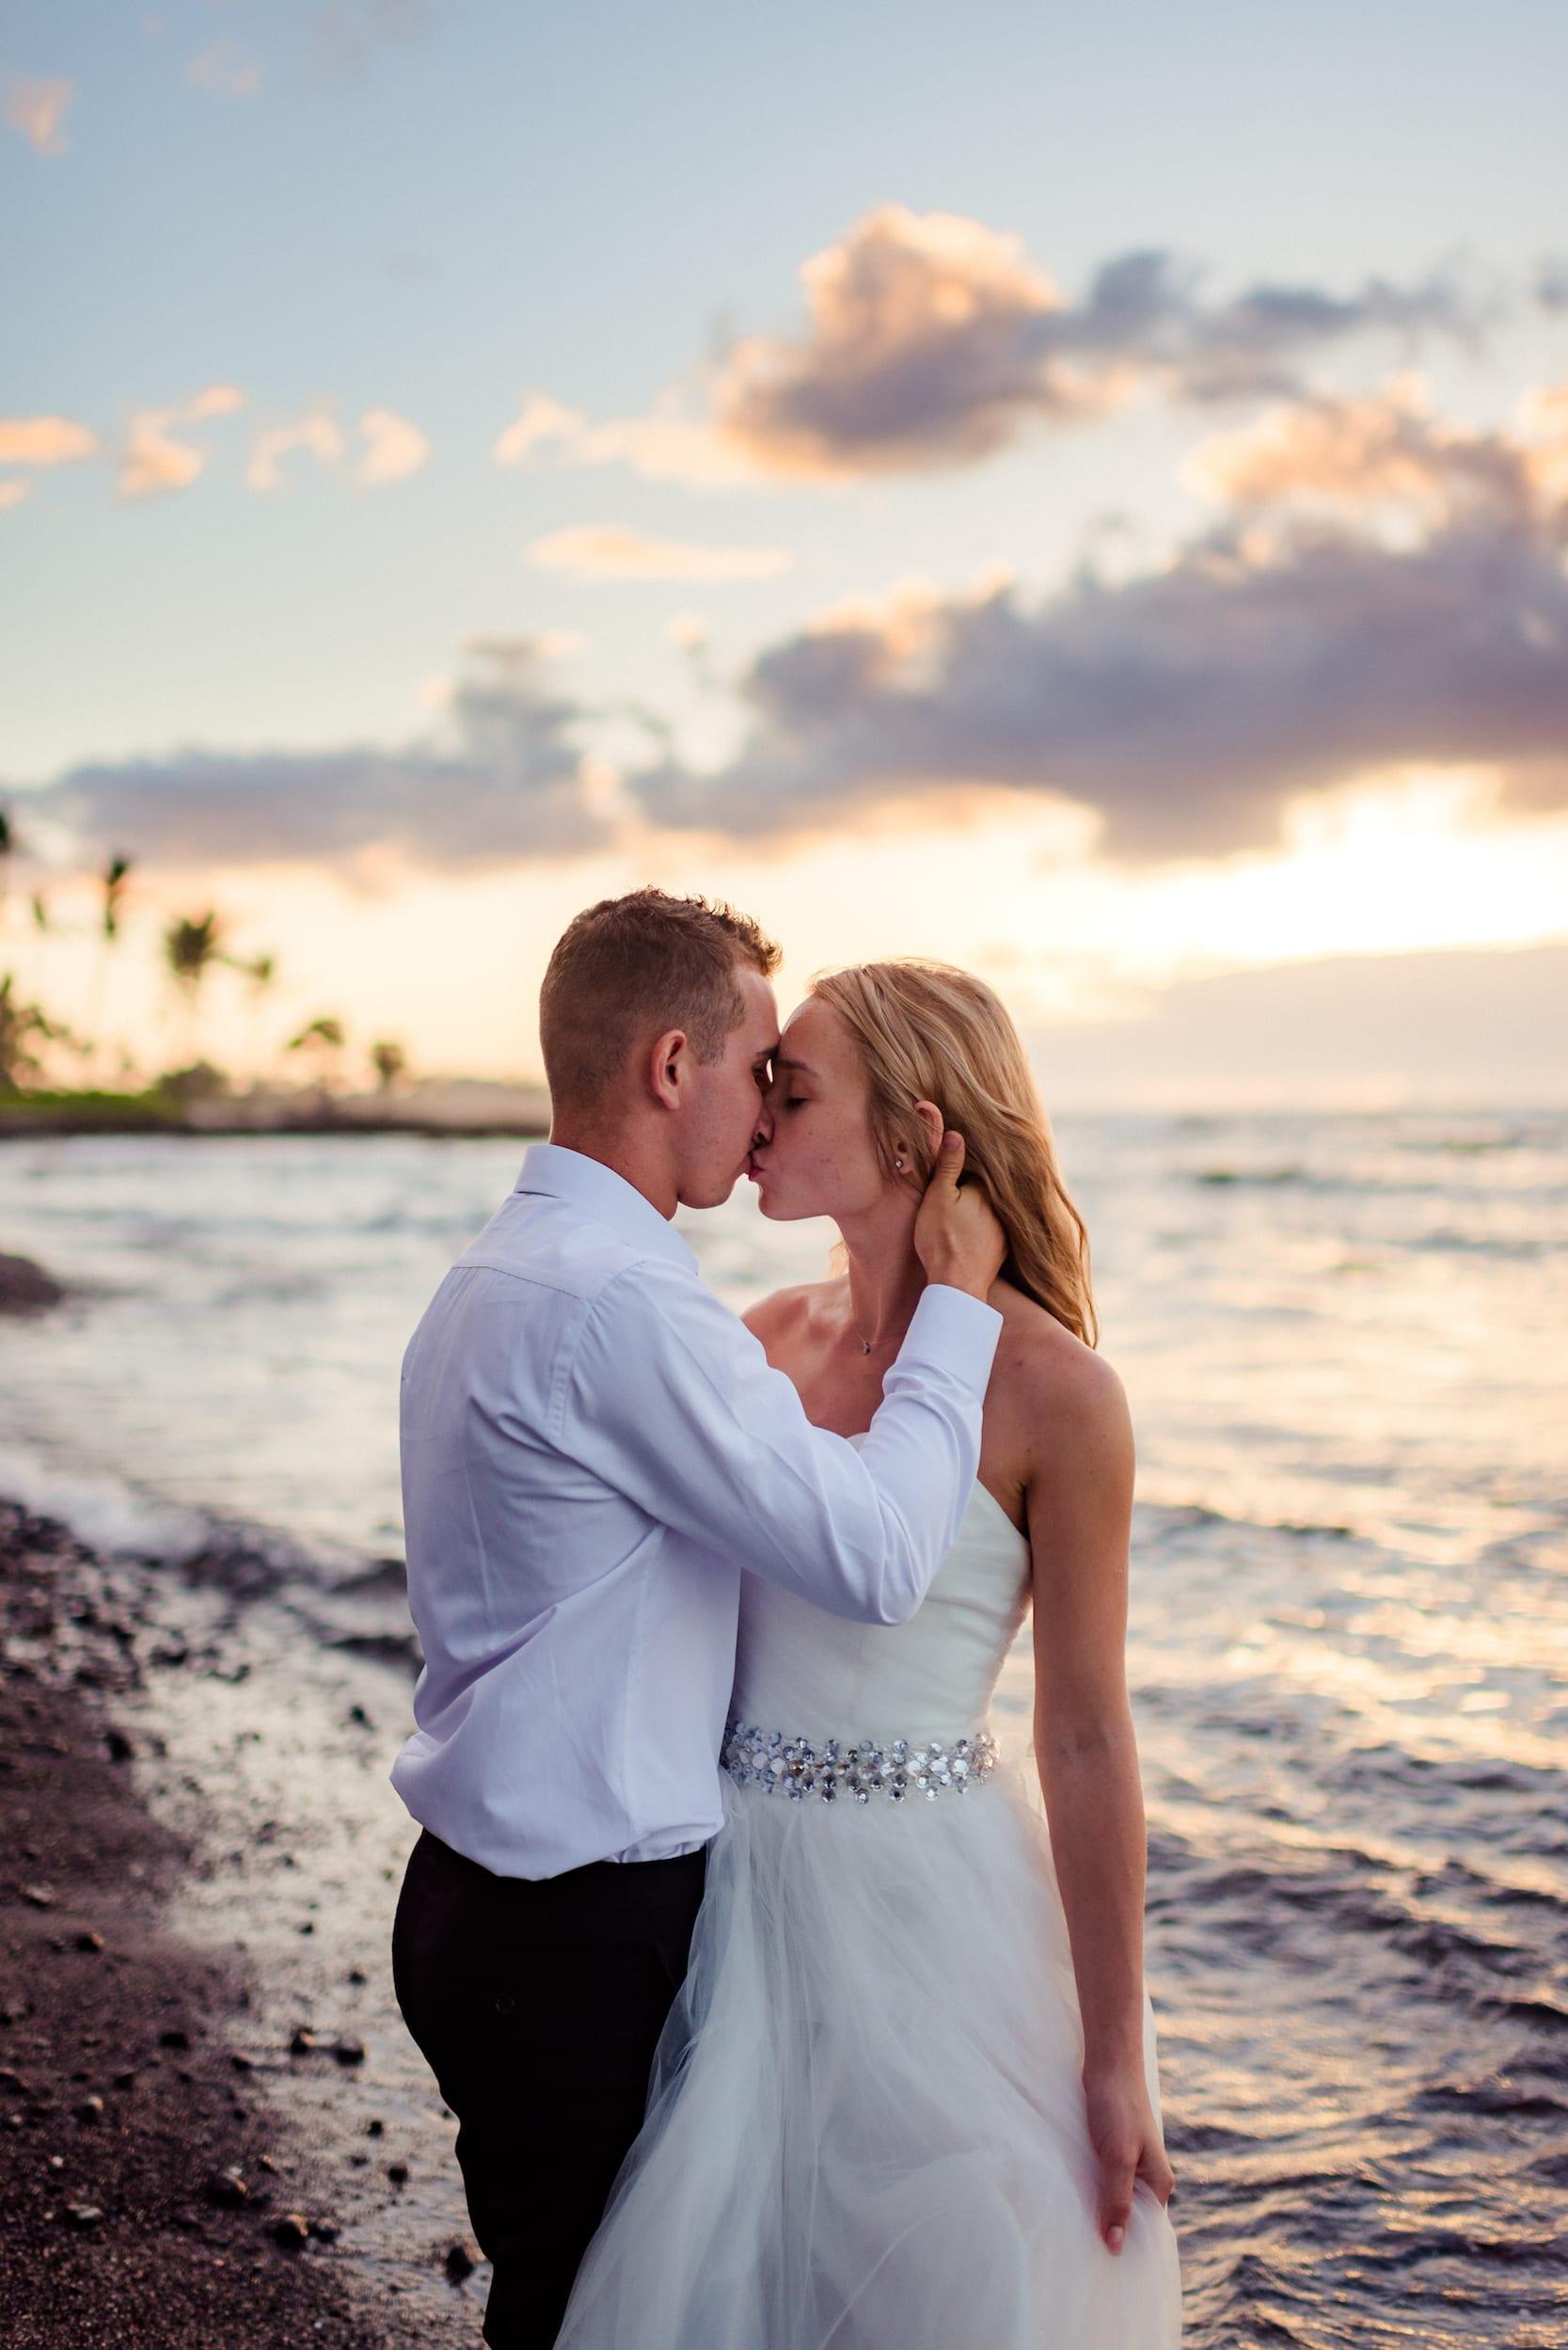 Big-Island-Elopement-Private-Wedding-Hawaii-Beach-18.jpg